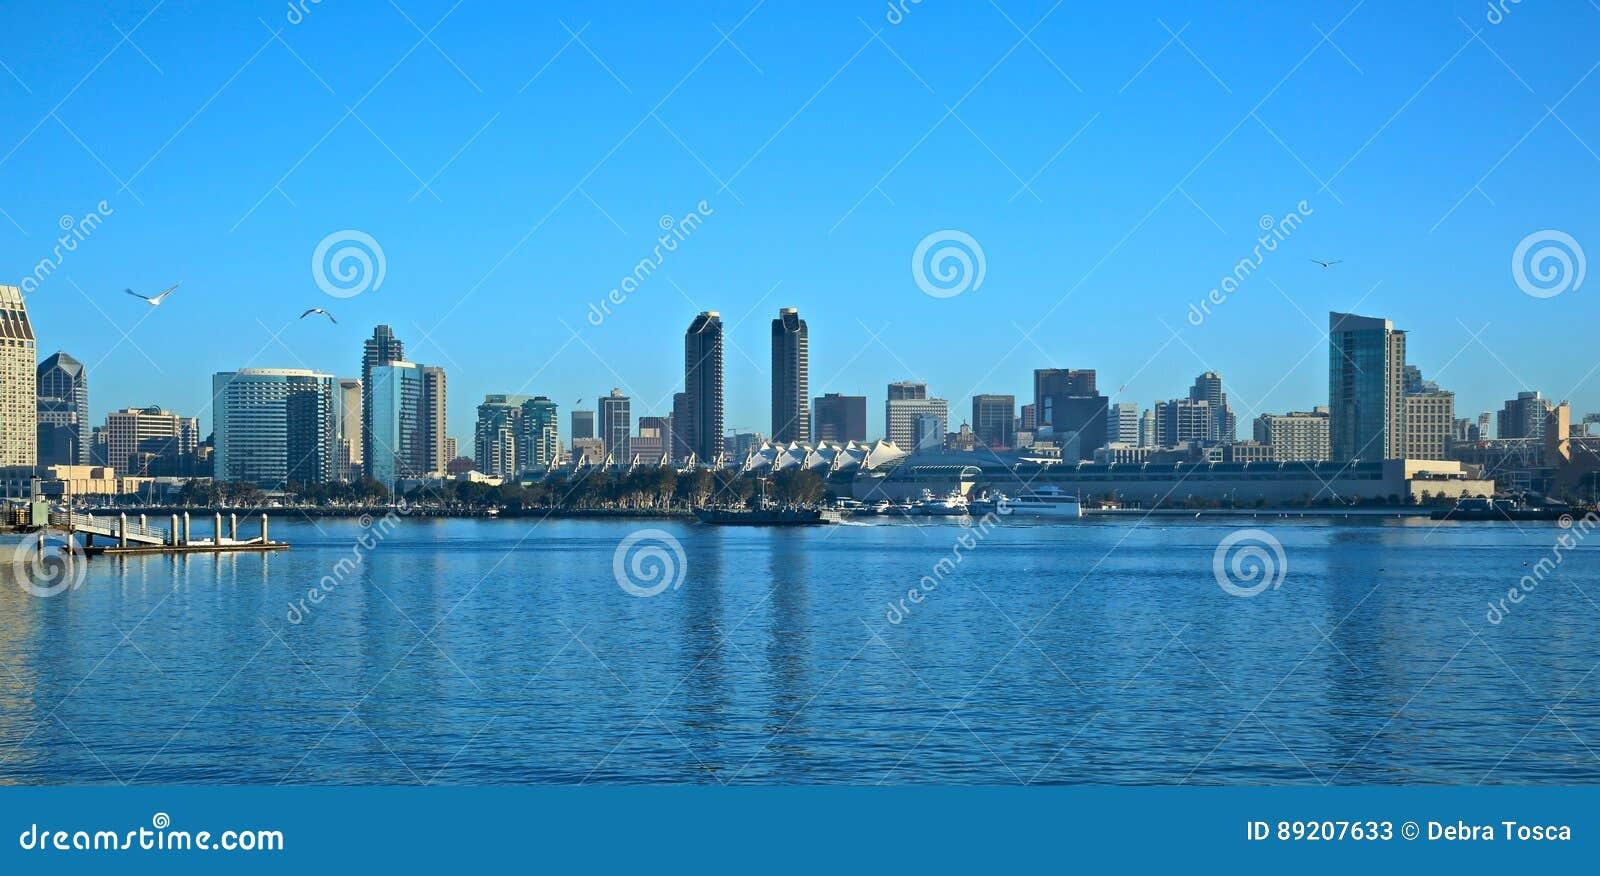 san diego california coastline stock image image 89207633. Black Bedroom Furniture Sets. Home Design Ideas